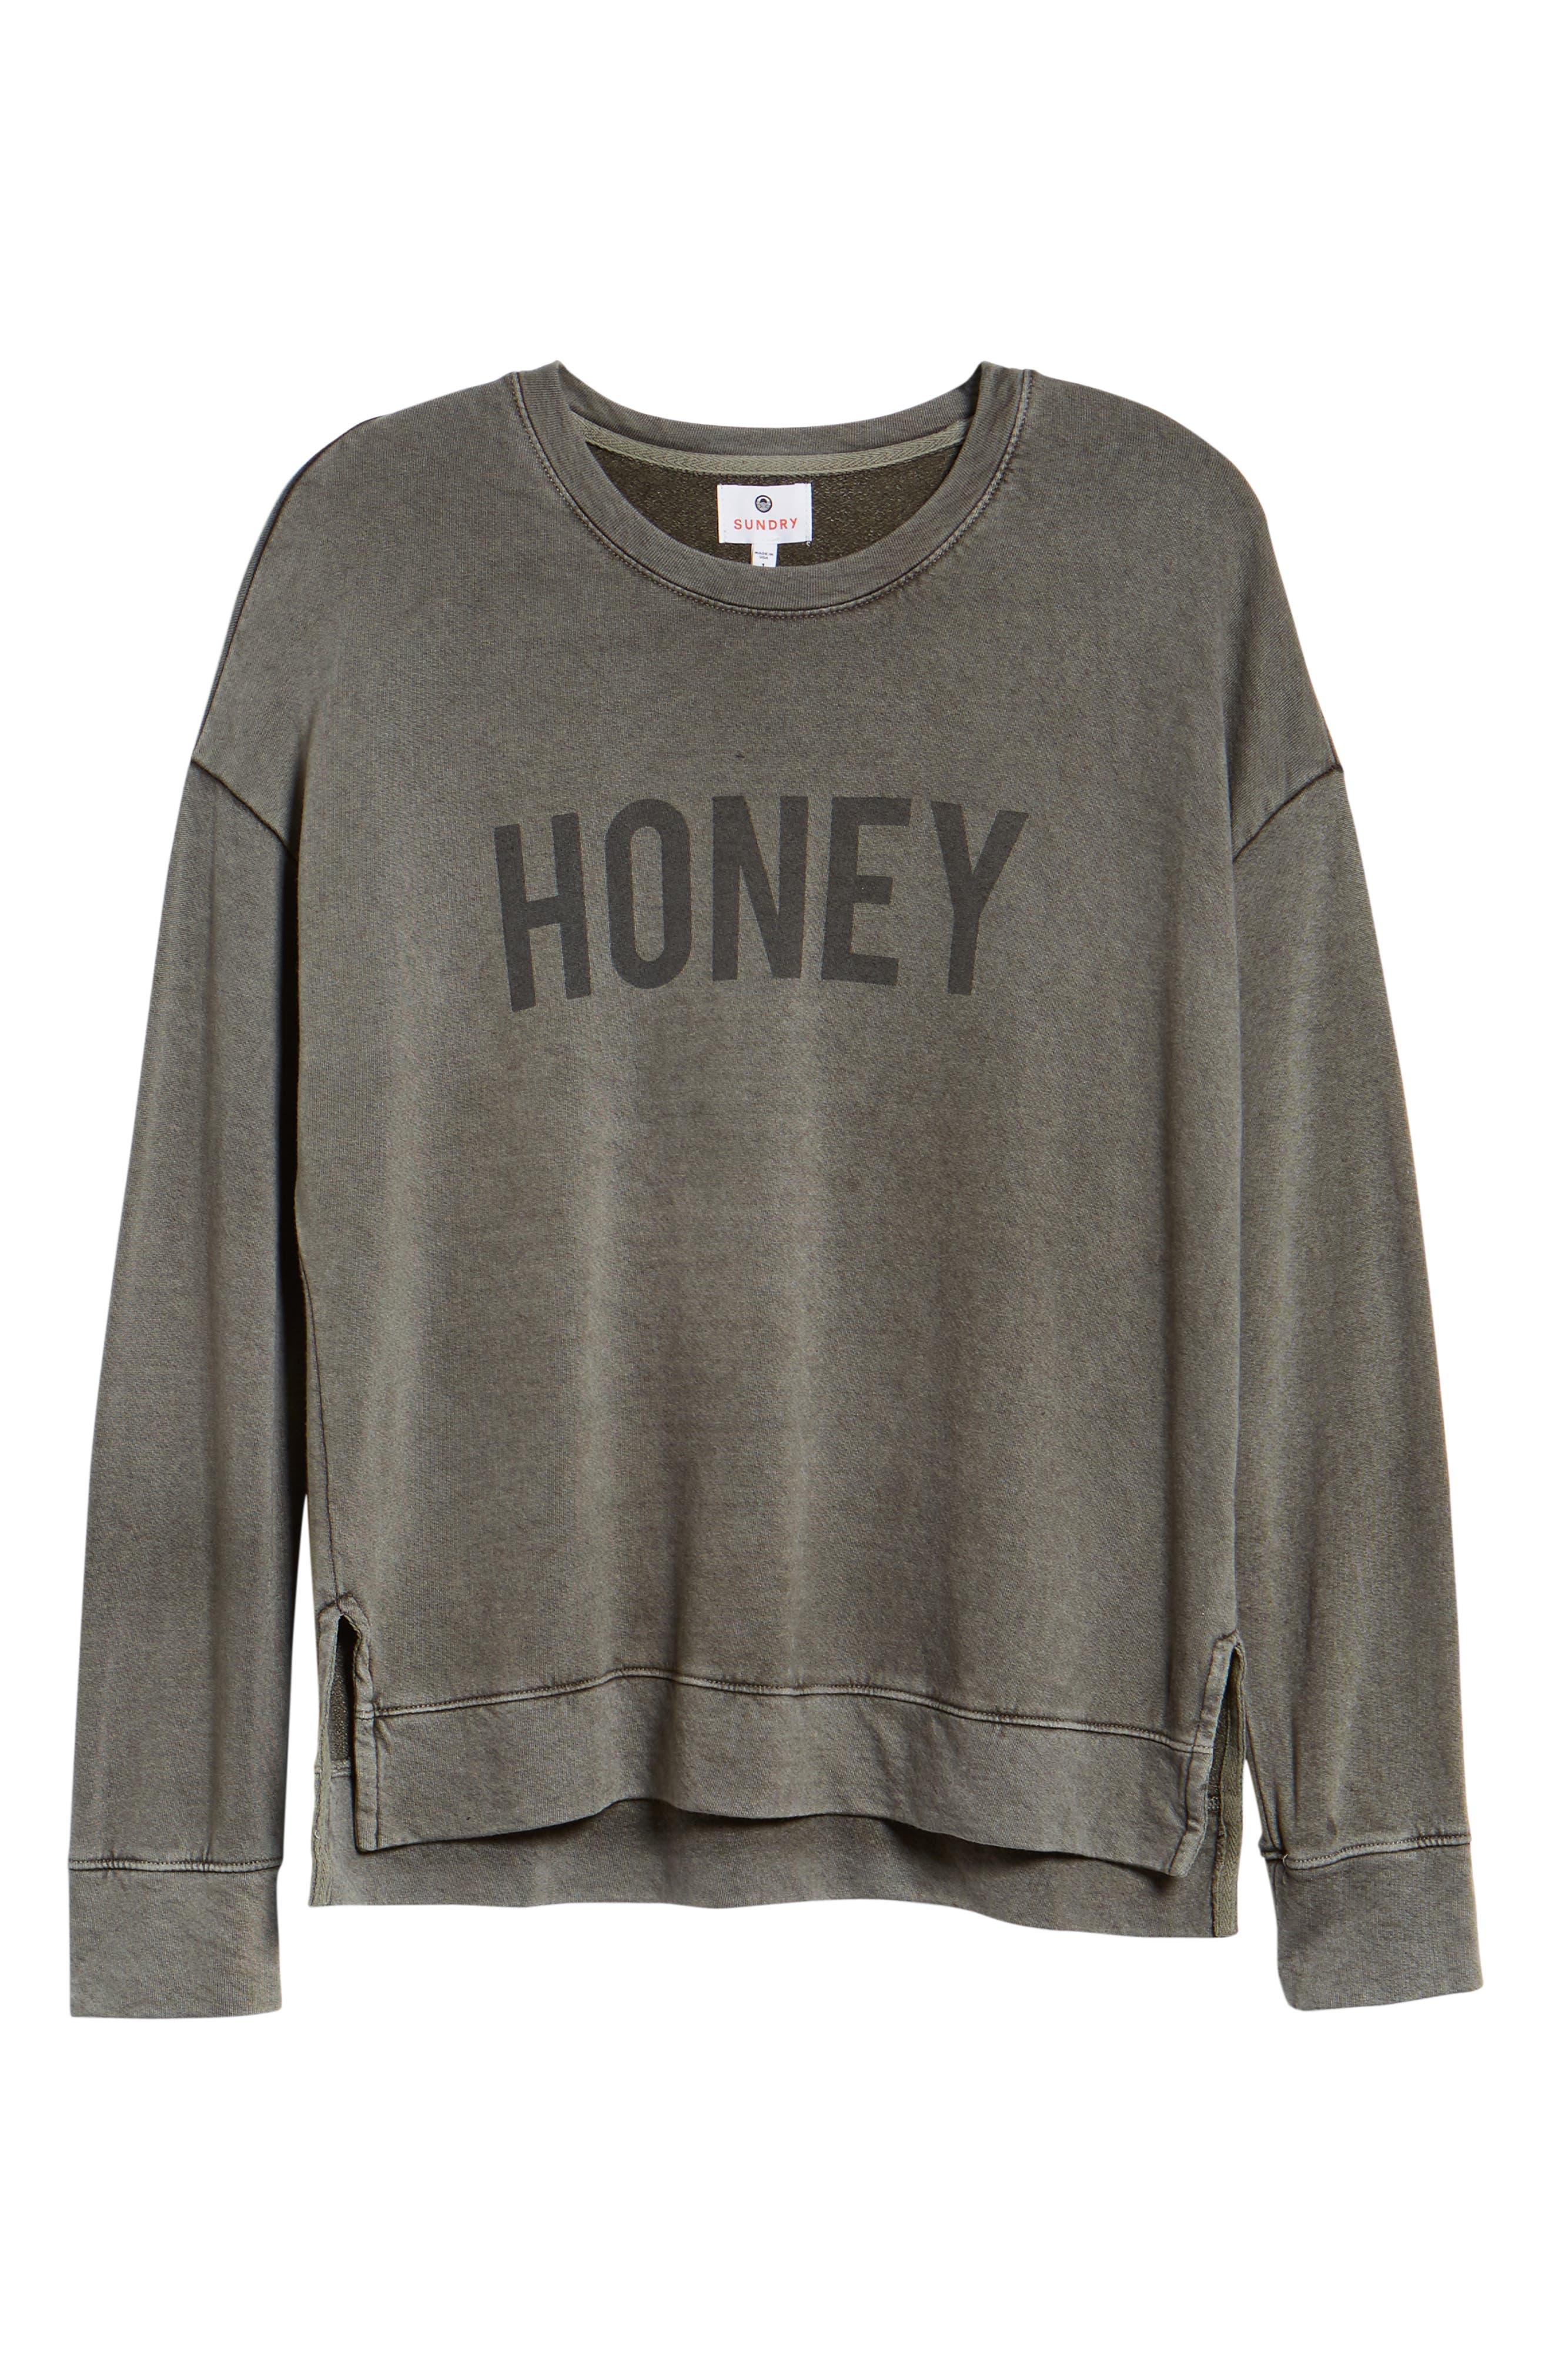 Honey Faded Sweatshirt,                             Alternate thumbnail 6, color,                             300